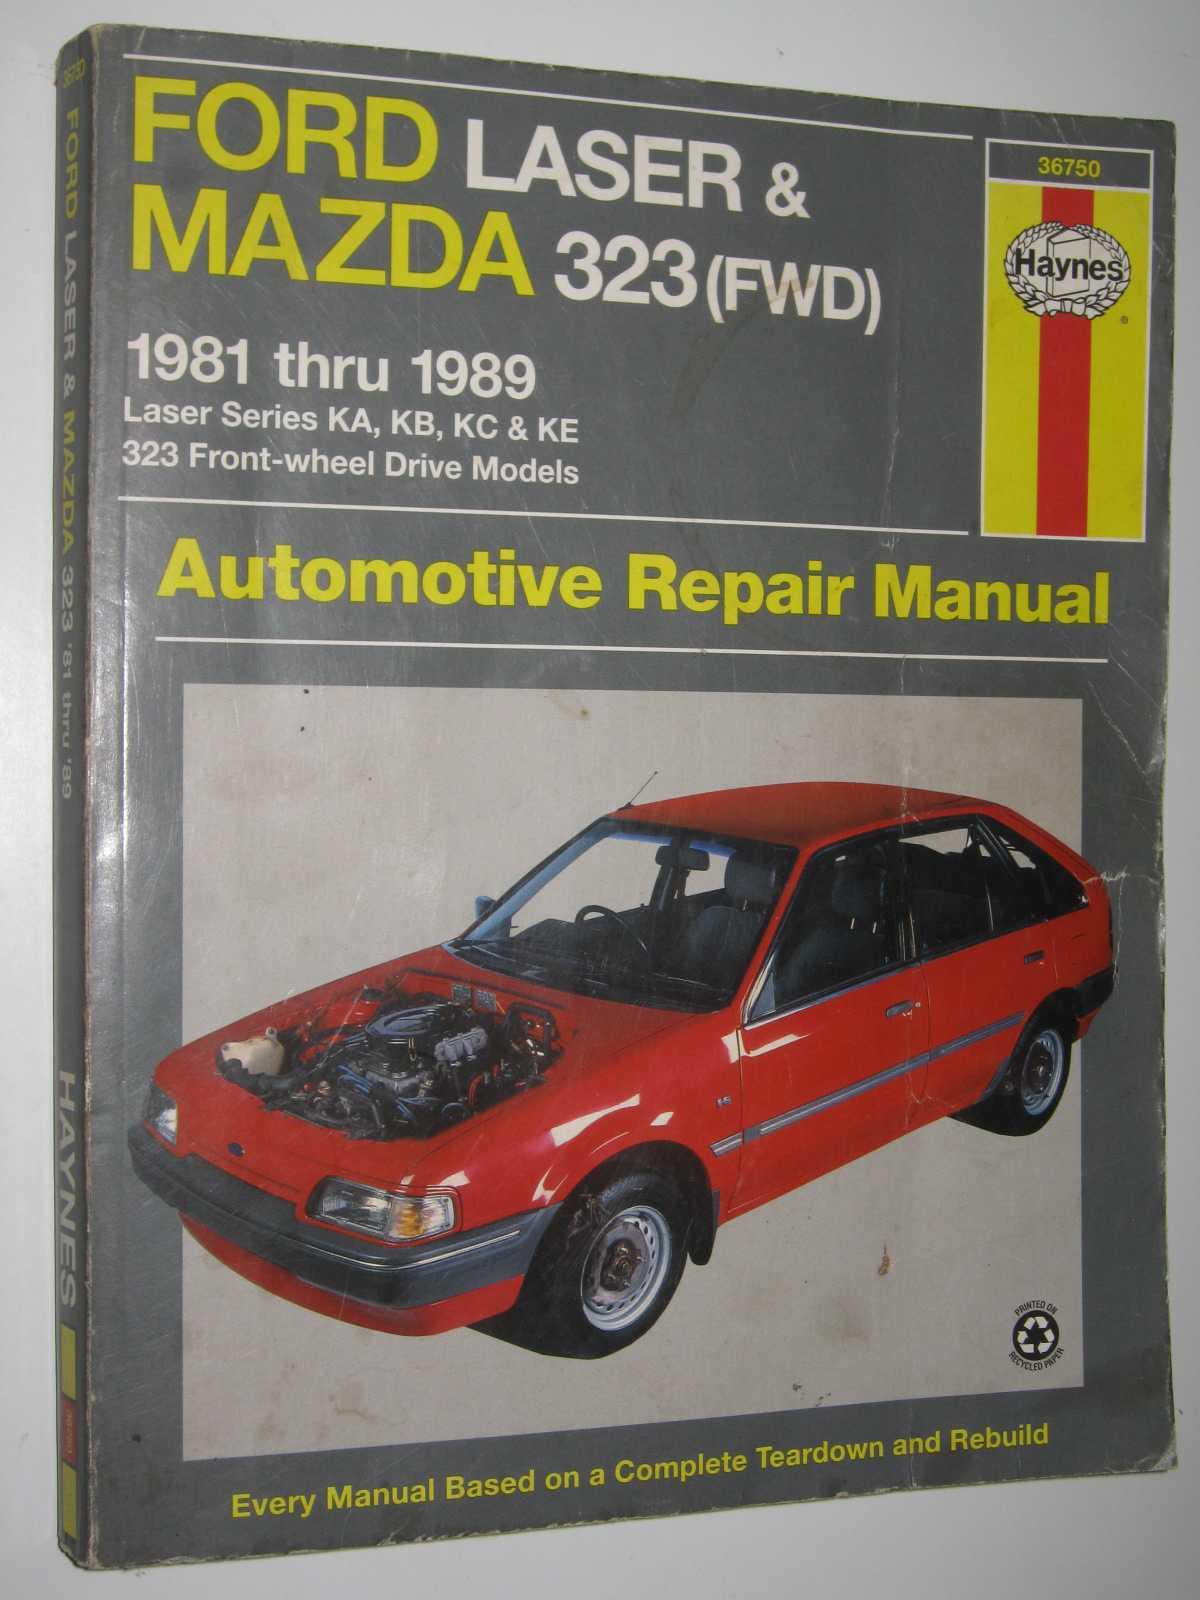 ford laser mazda 323 automotive repair manual 1981 thru 1989 rh manyhillsbooks com Ford Laser Hatchback 1984 1990 Ford Laser